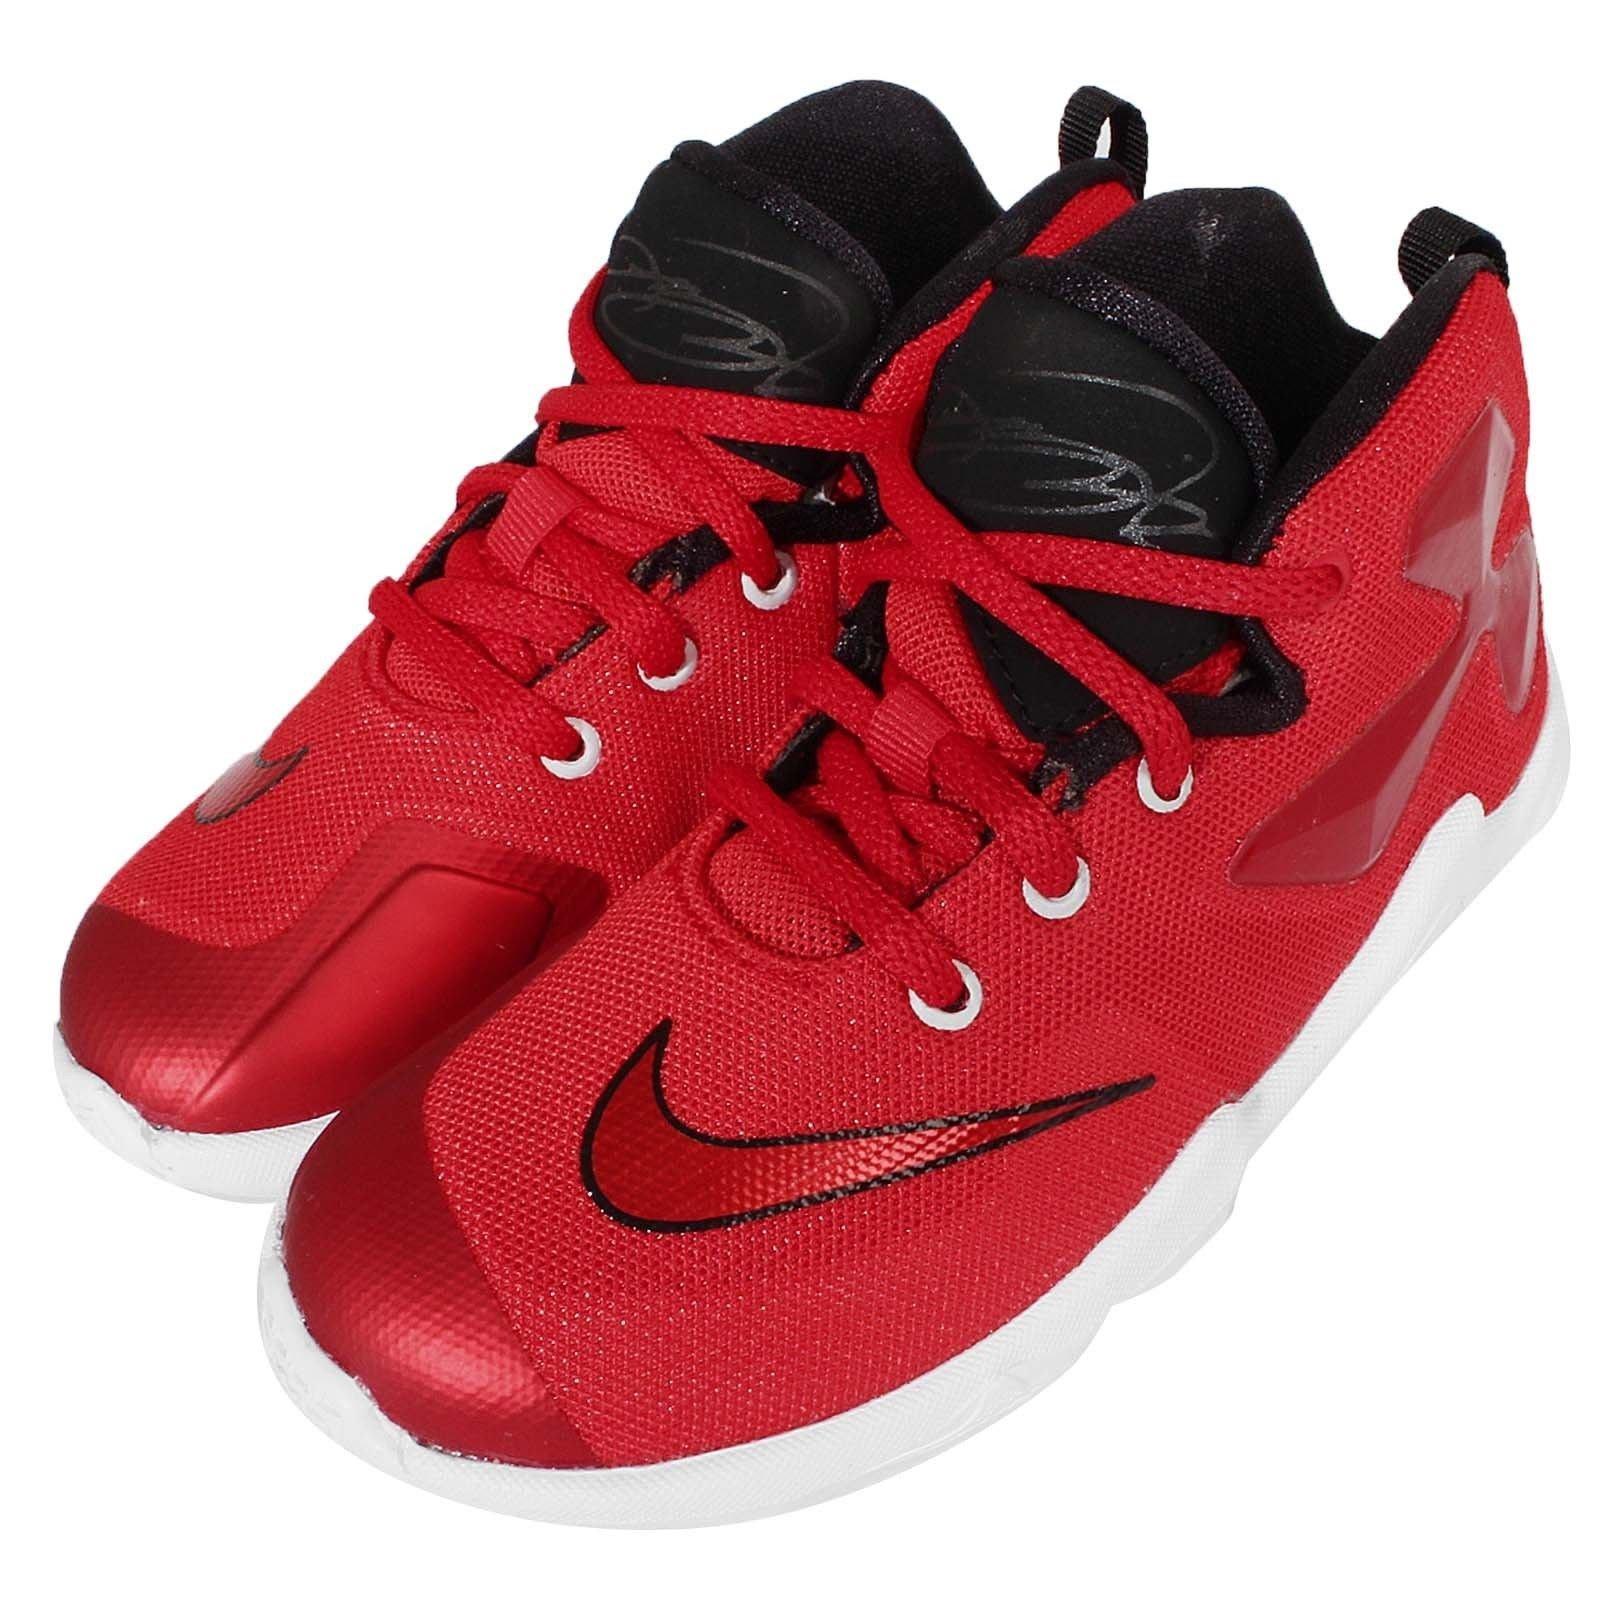 de1cbff094a9 CodE  NIKE LEBRON XIII TD 籃球學步鞋(紅白黑) 808711-610 LBJ 13 小童 ...